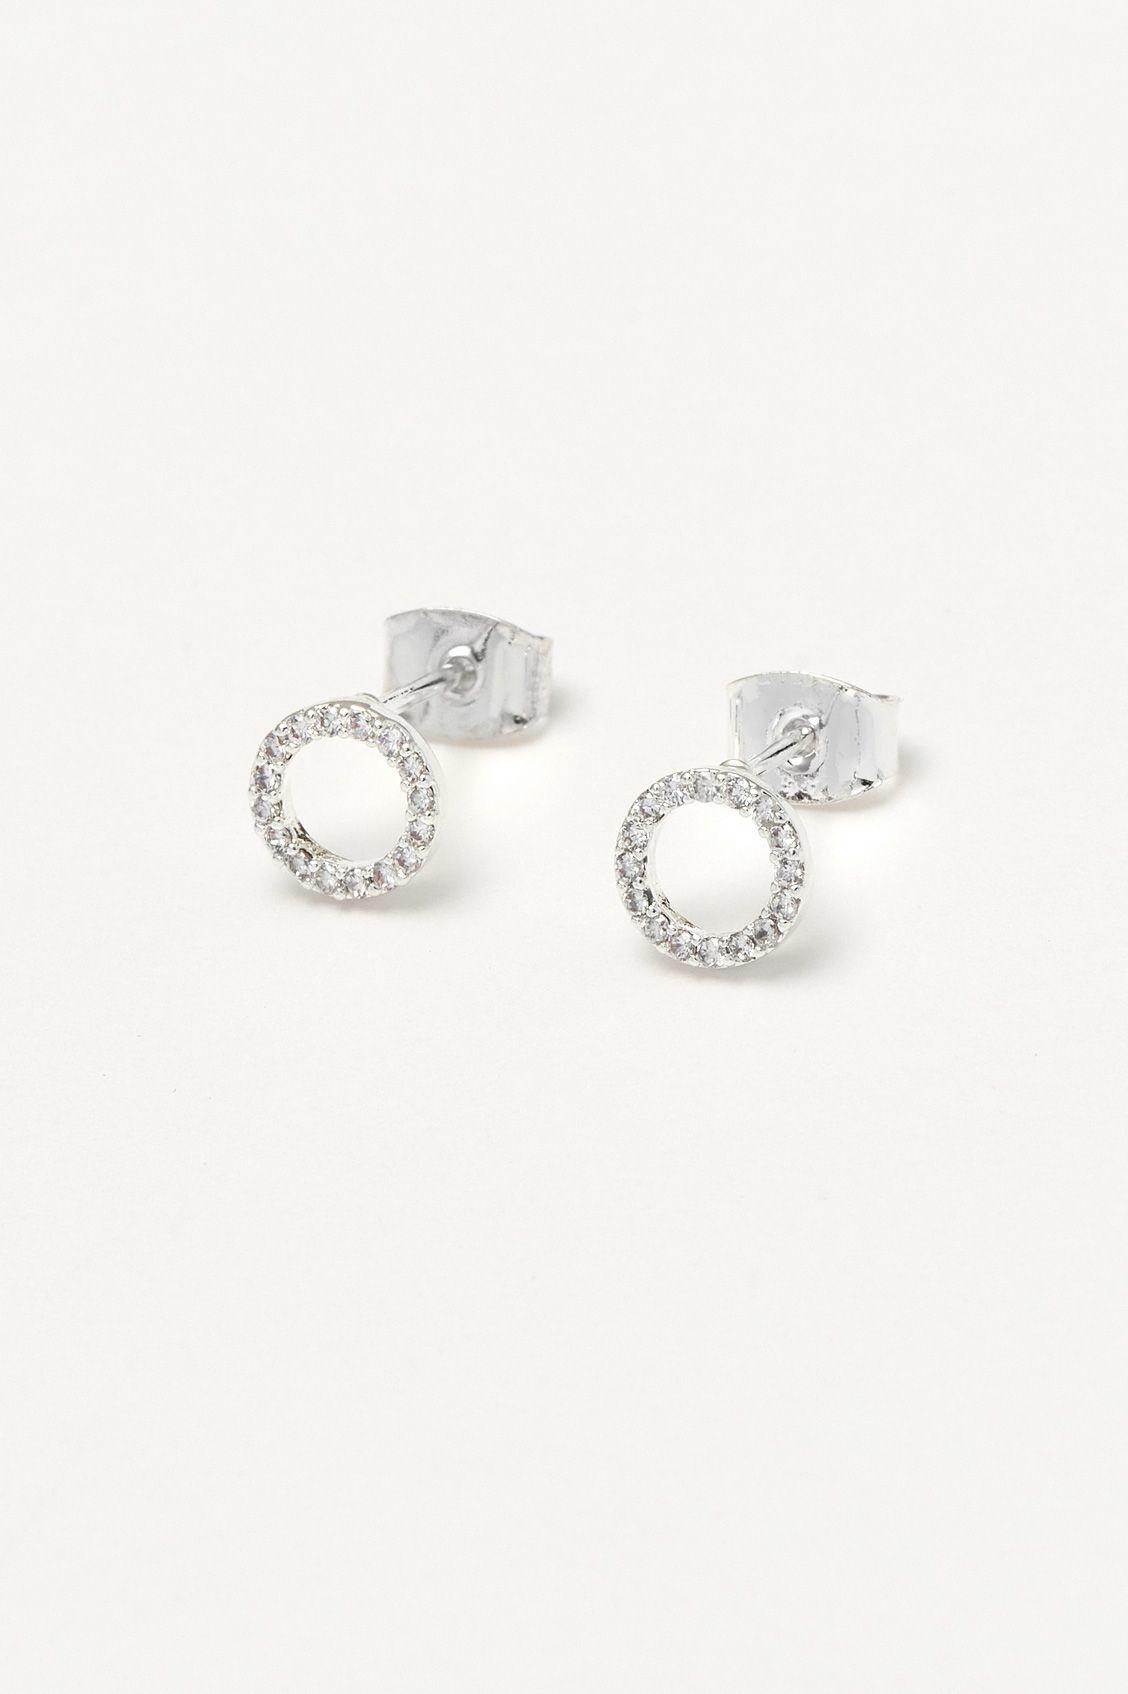 estella bartlett [EB3120] CZ Circle Earrings Silver Plated